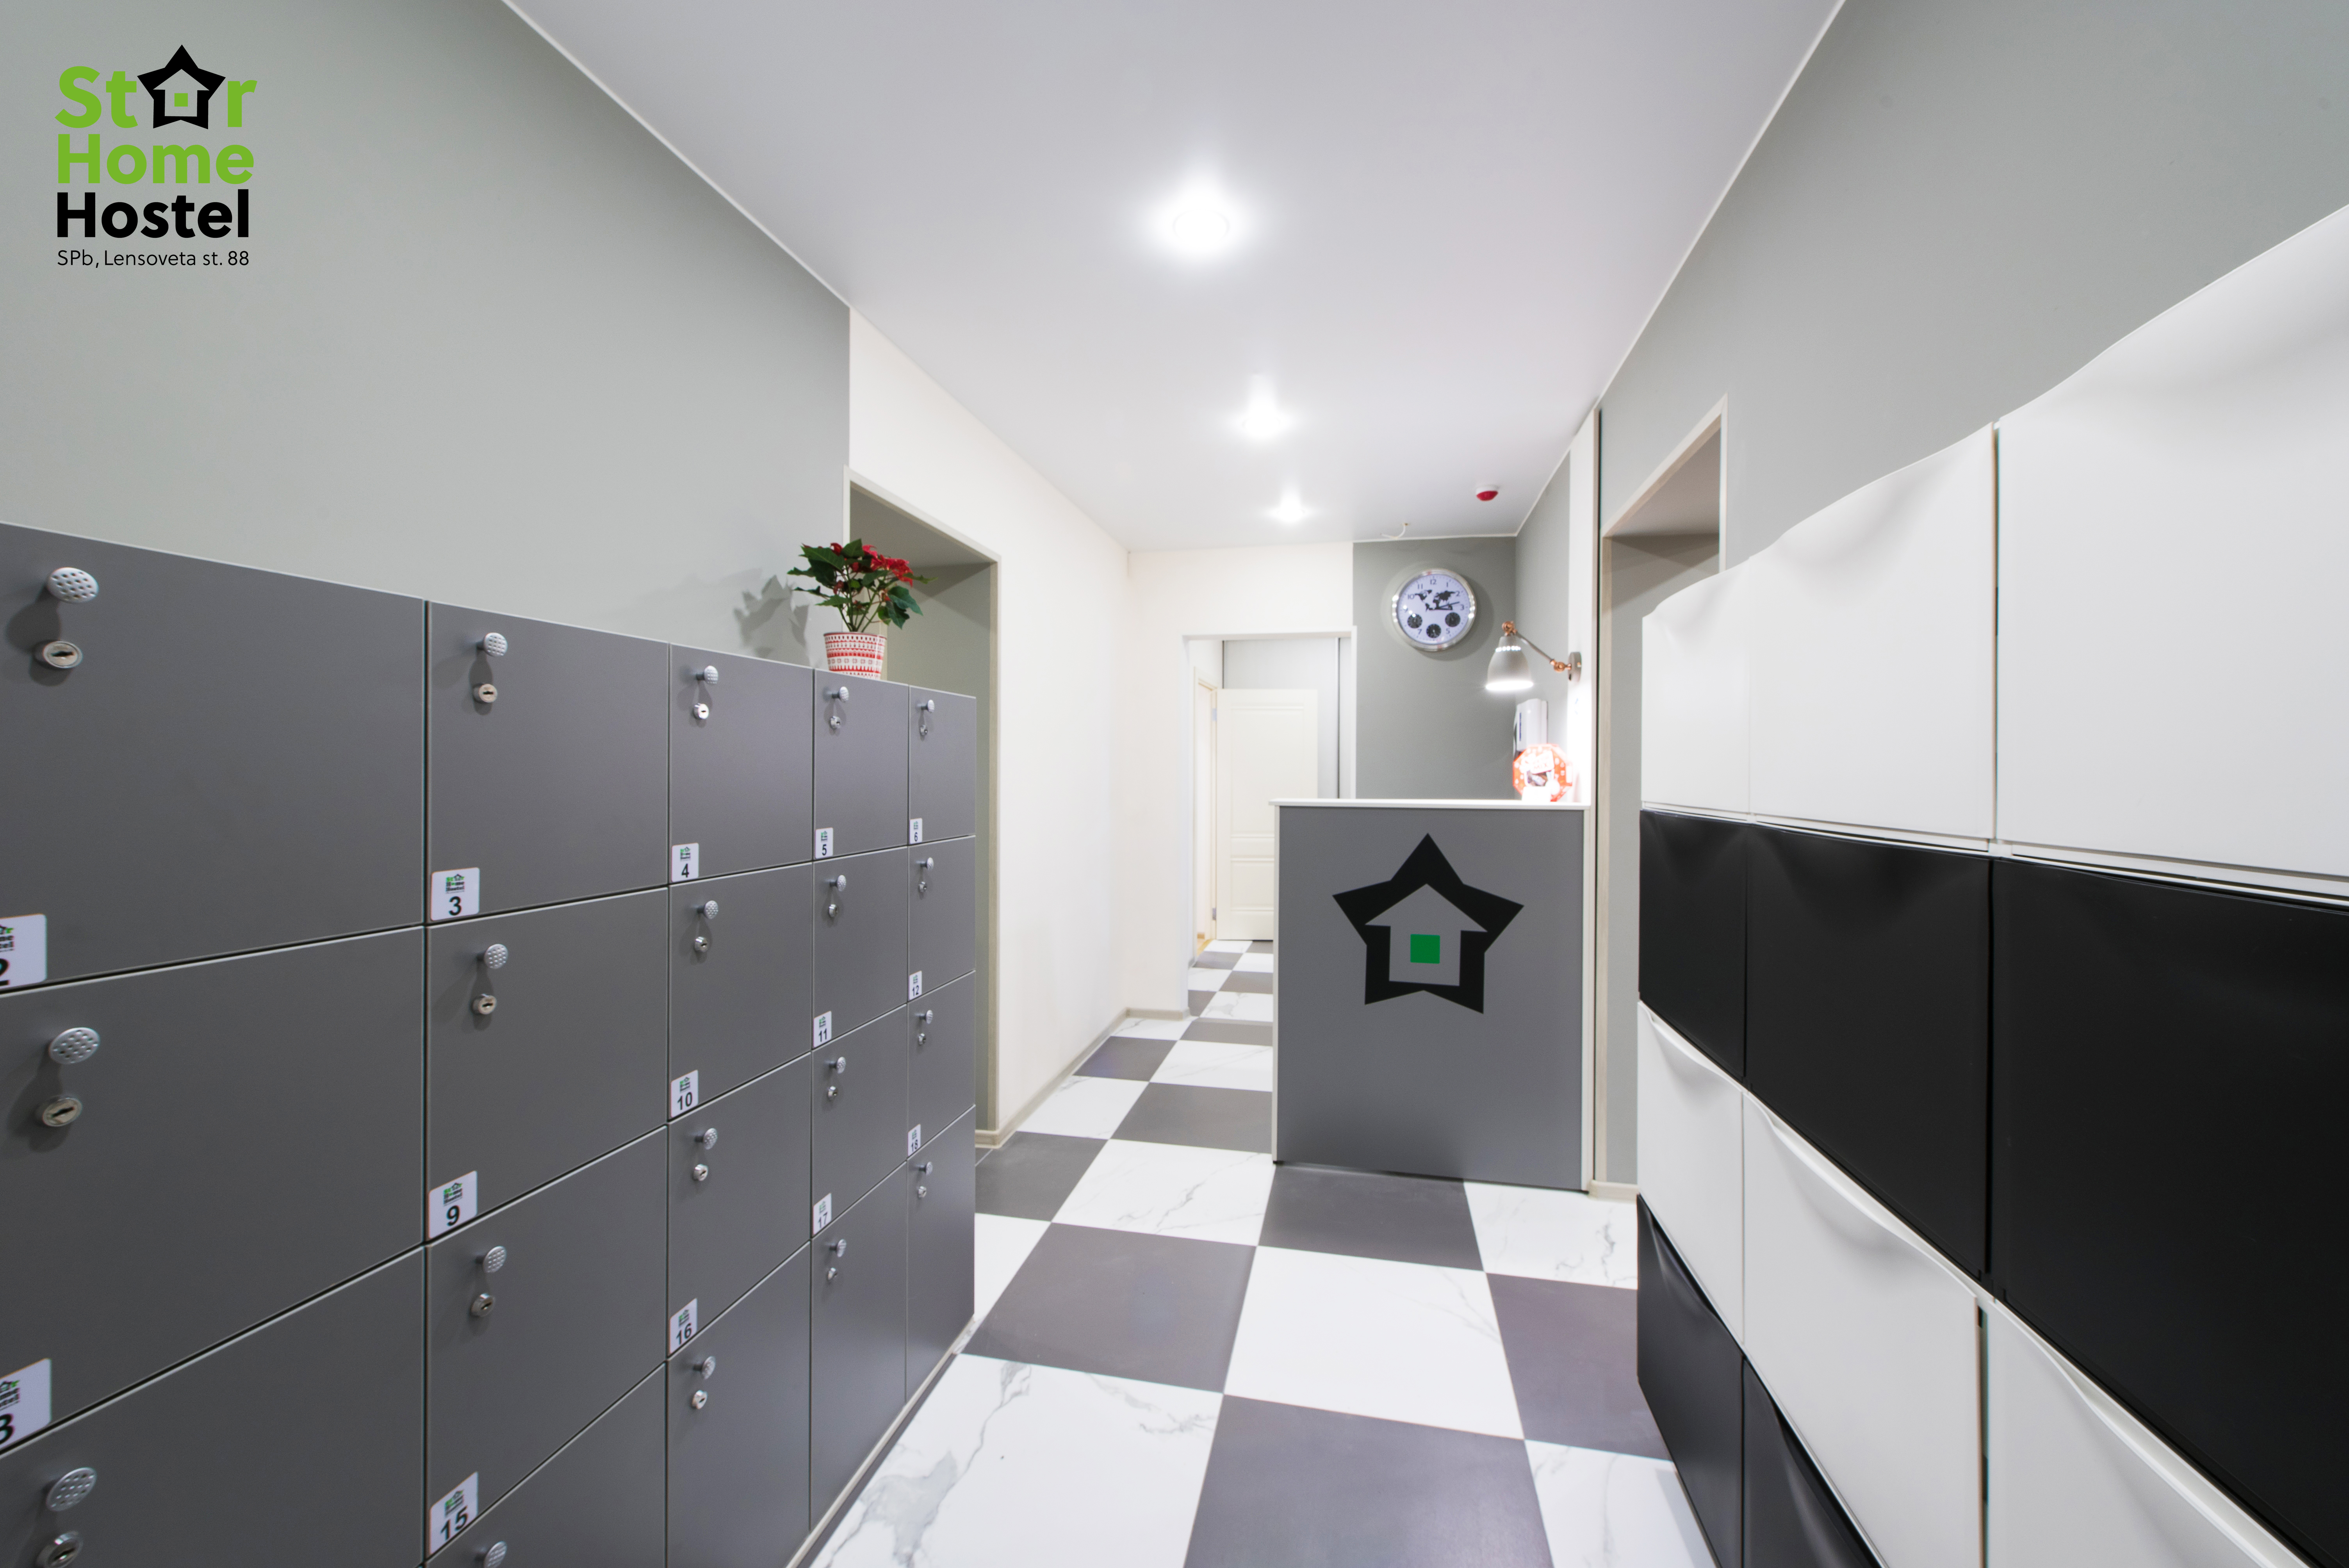 Star Home Hostel